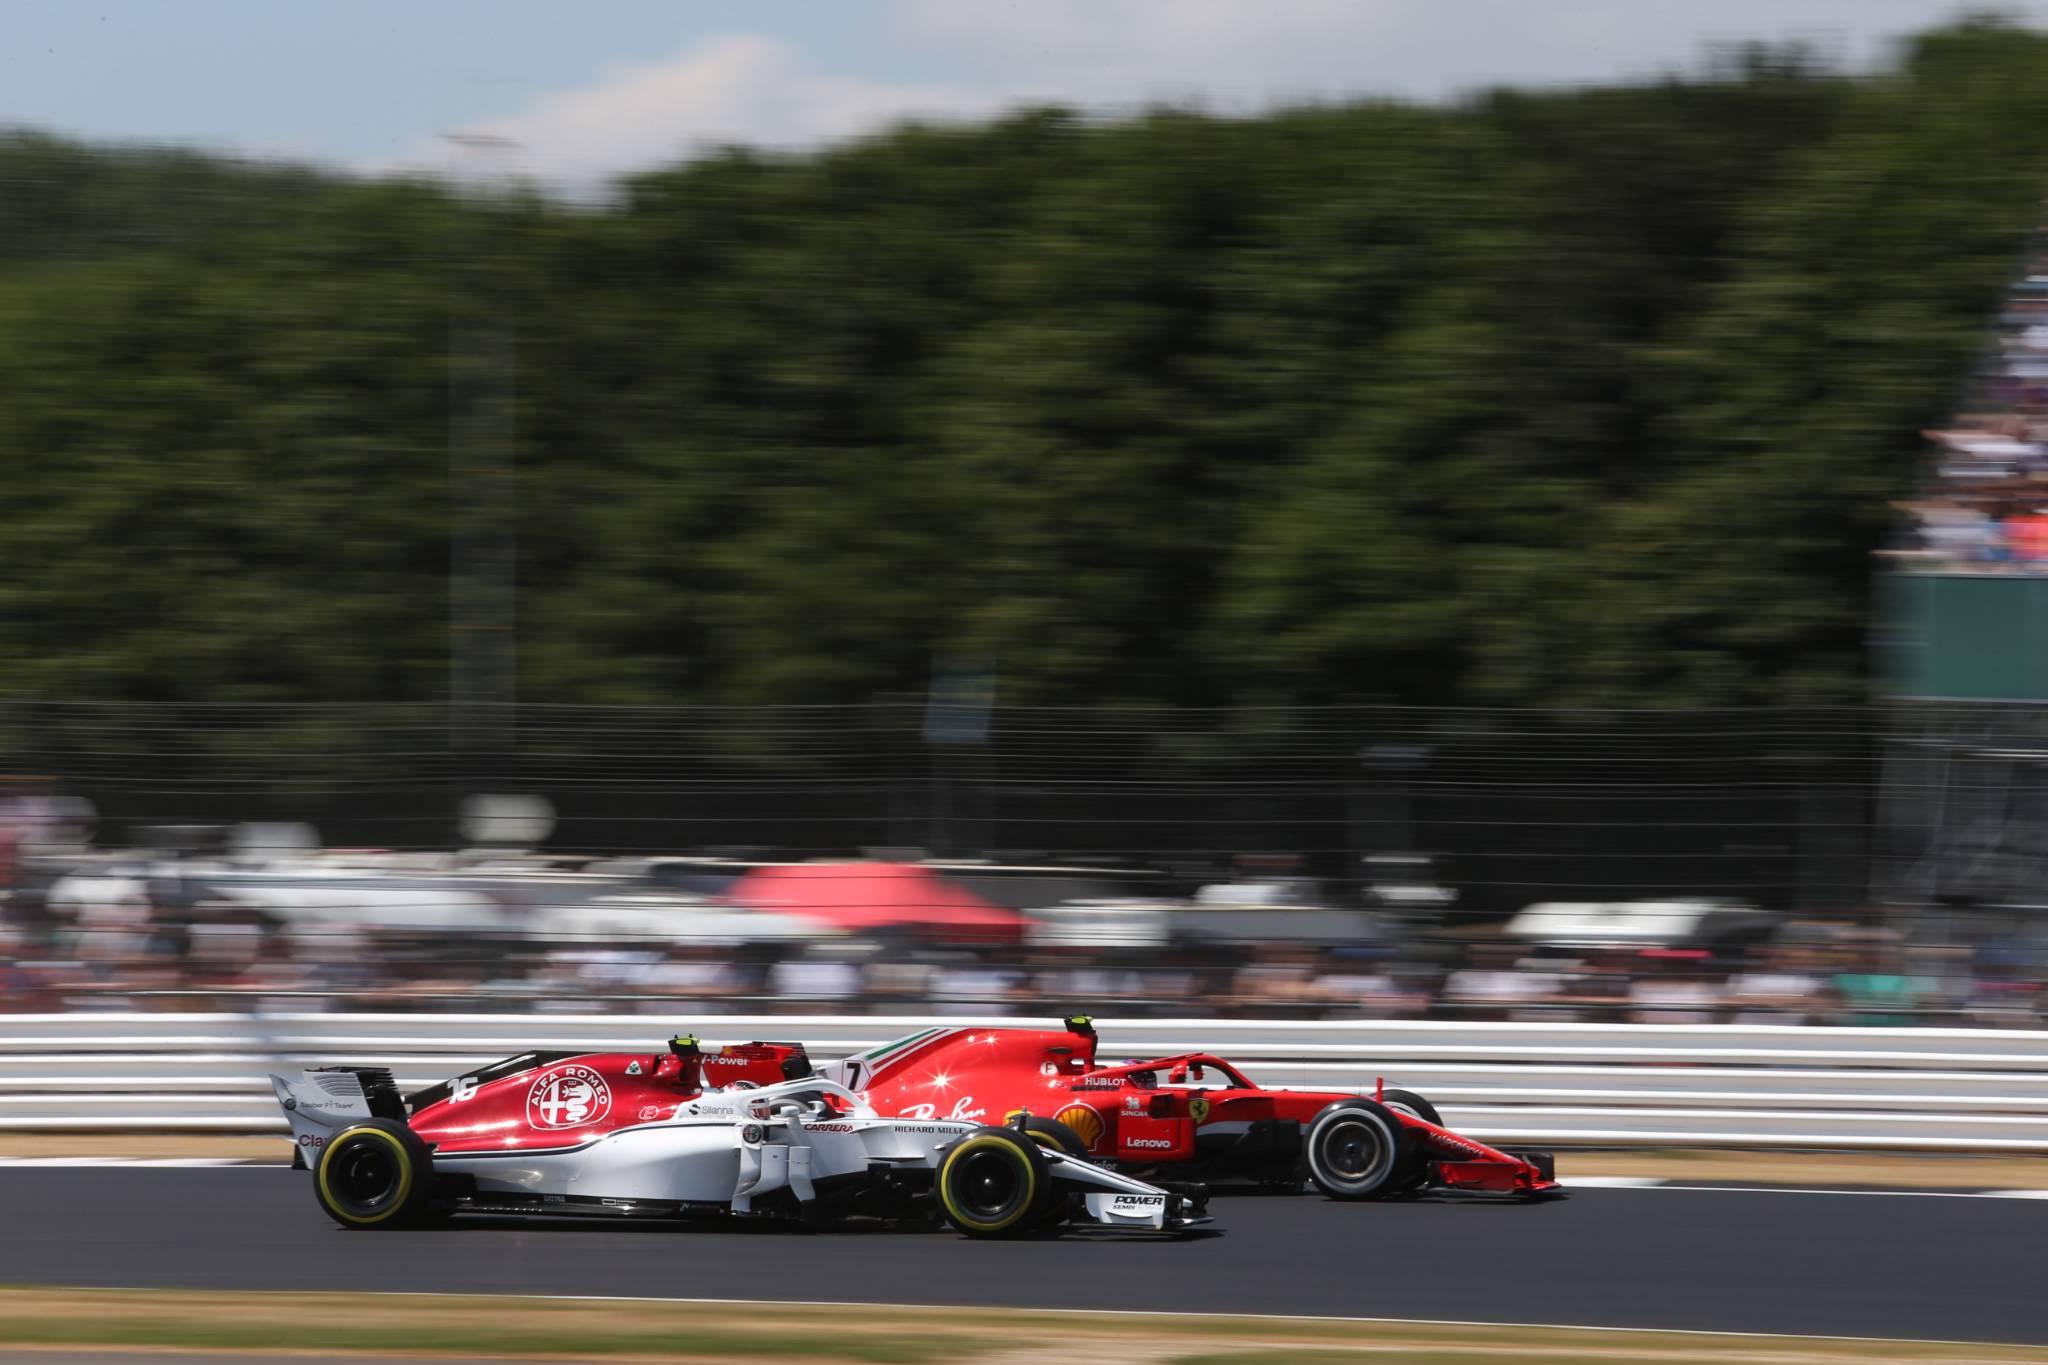 07.07.2018- Qualifying, Kimi Raikkonen (FIN) Scuderia Ferrari SF71H and Charles Leclerc (GER) Alfa Romeo Sauber C37